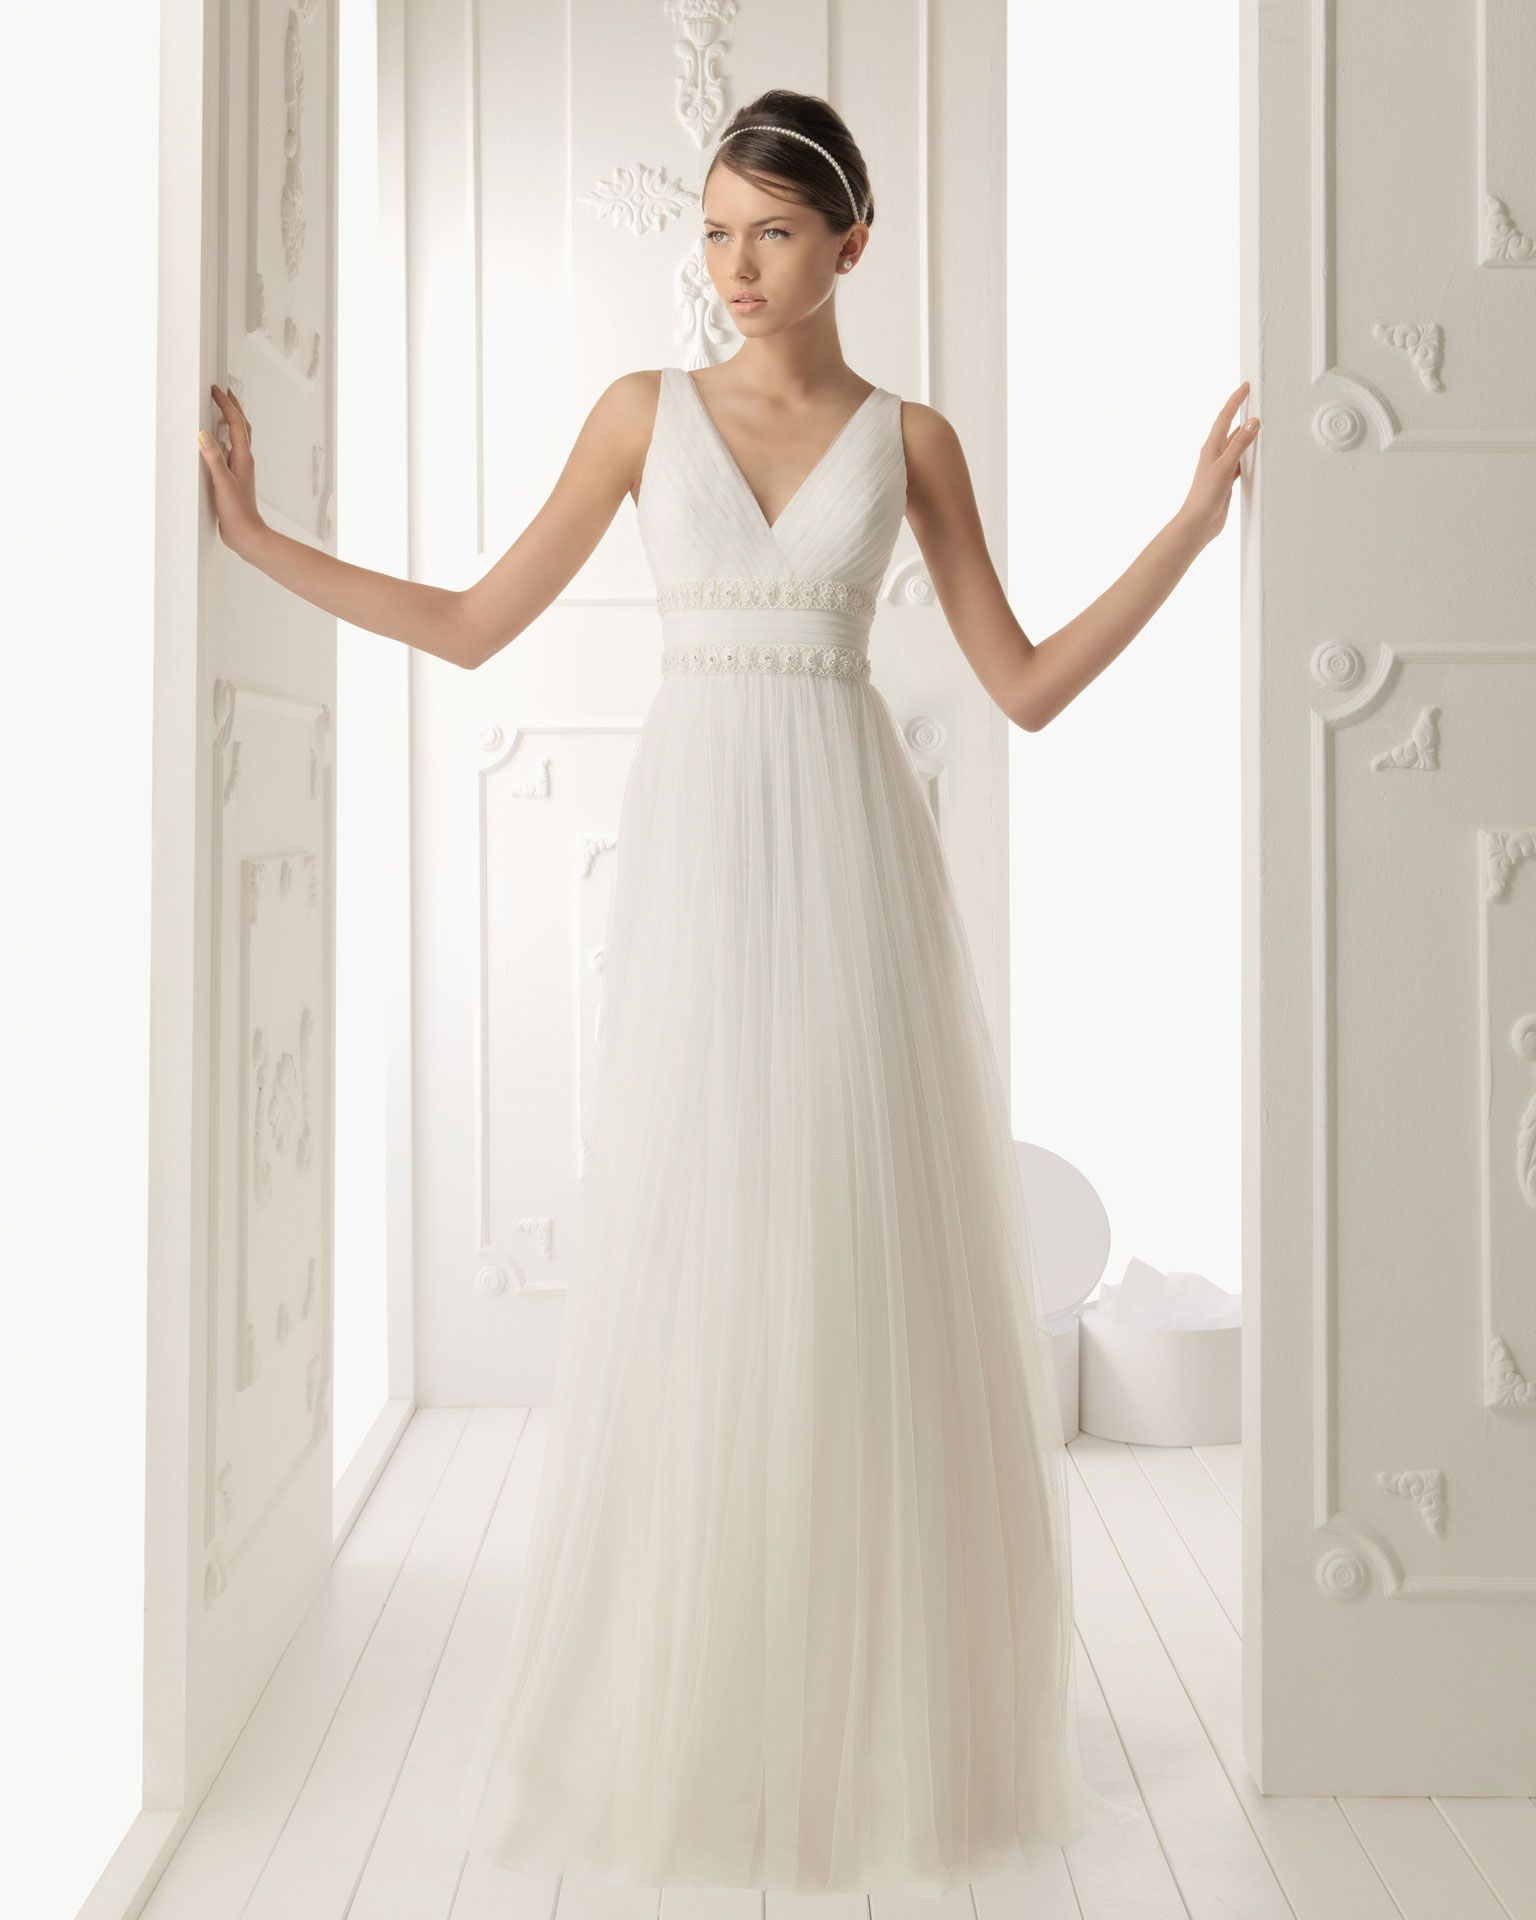 RENE - Beaded tulle dress, in ecru T50 Pearl tiara, in ecru (SImple ...